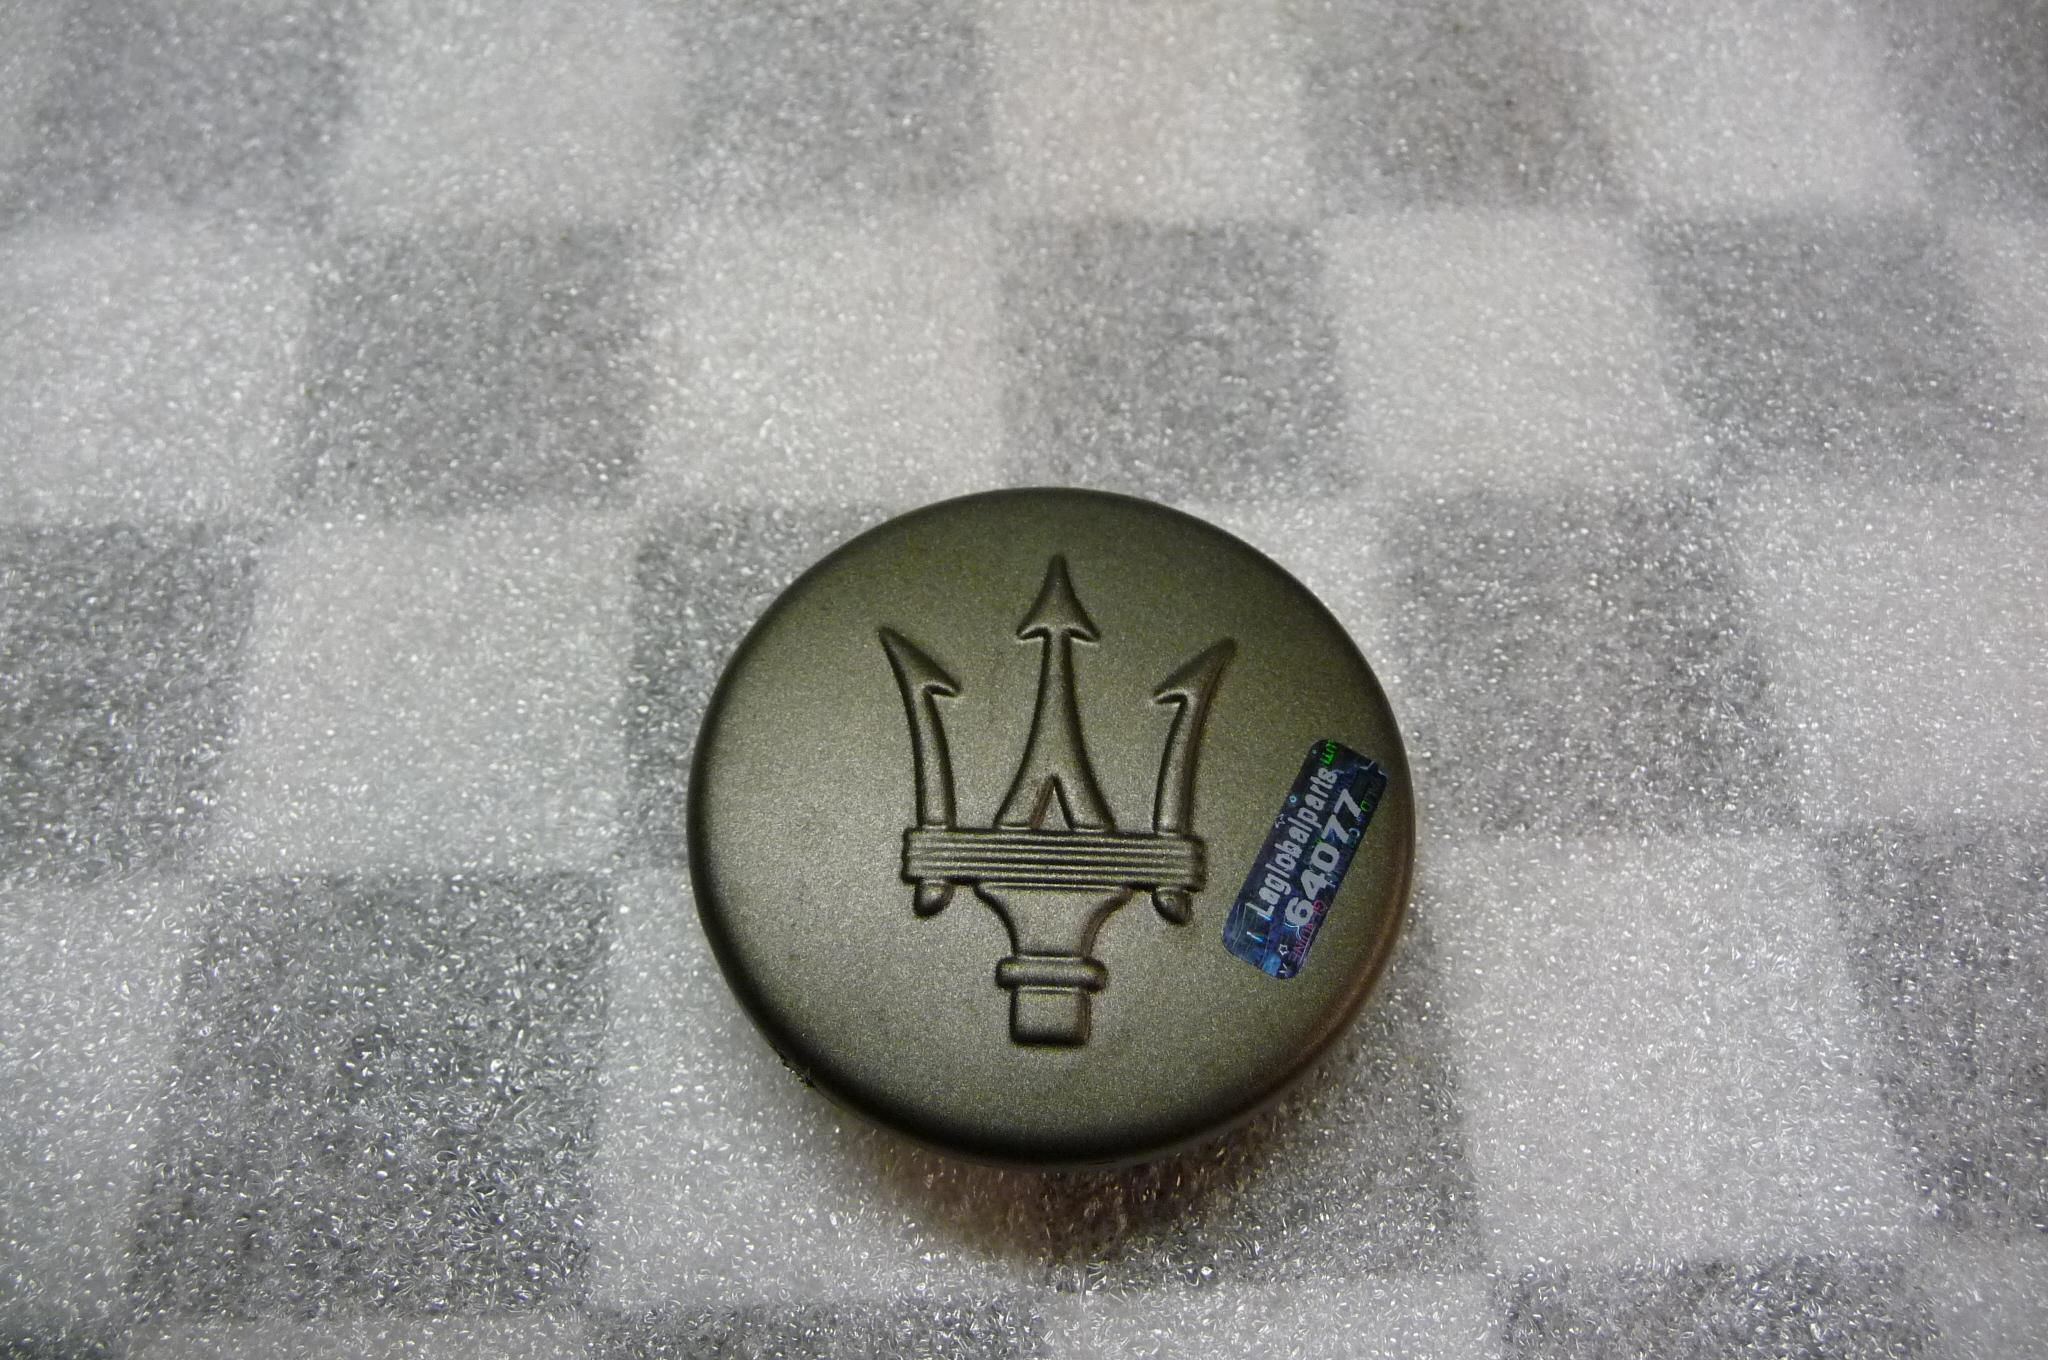 Maserati Factory, OEM Genuine Grey Wheel Center Cap  - Used Auto Parts Store | LA Global Parts